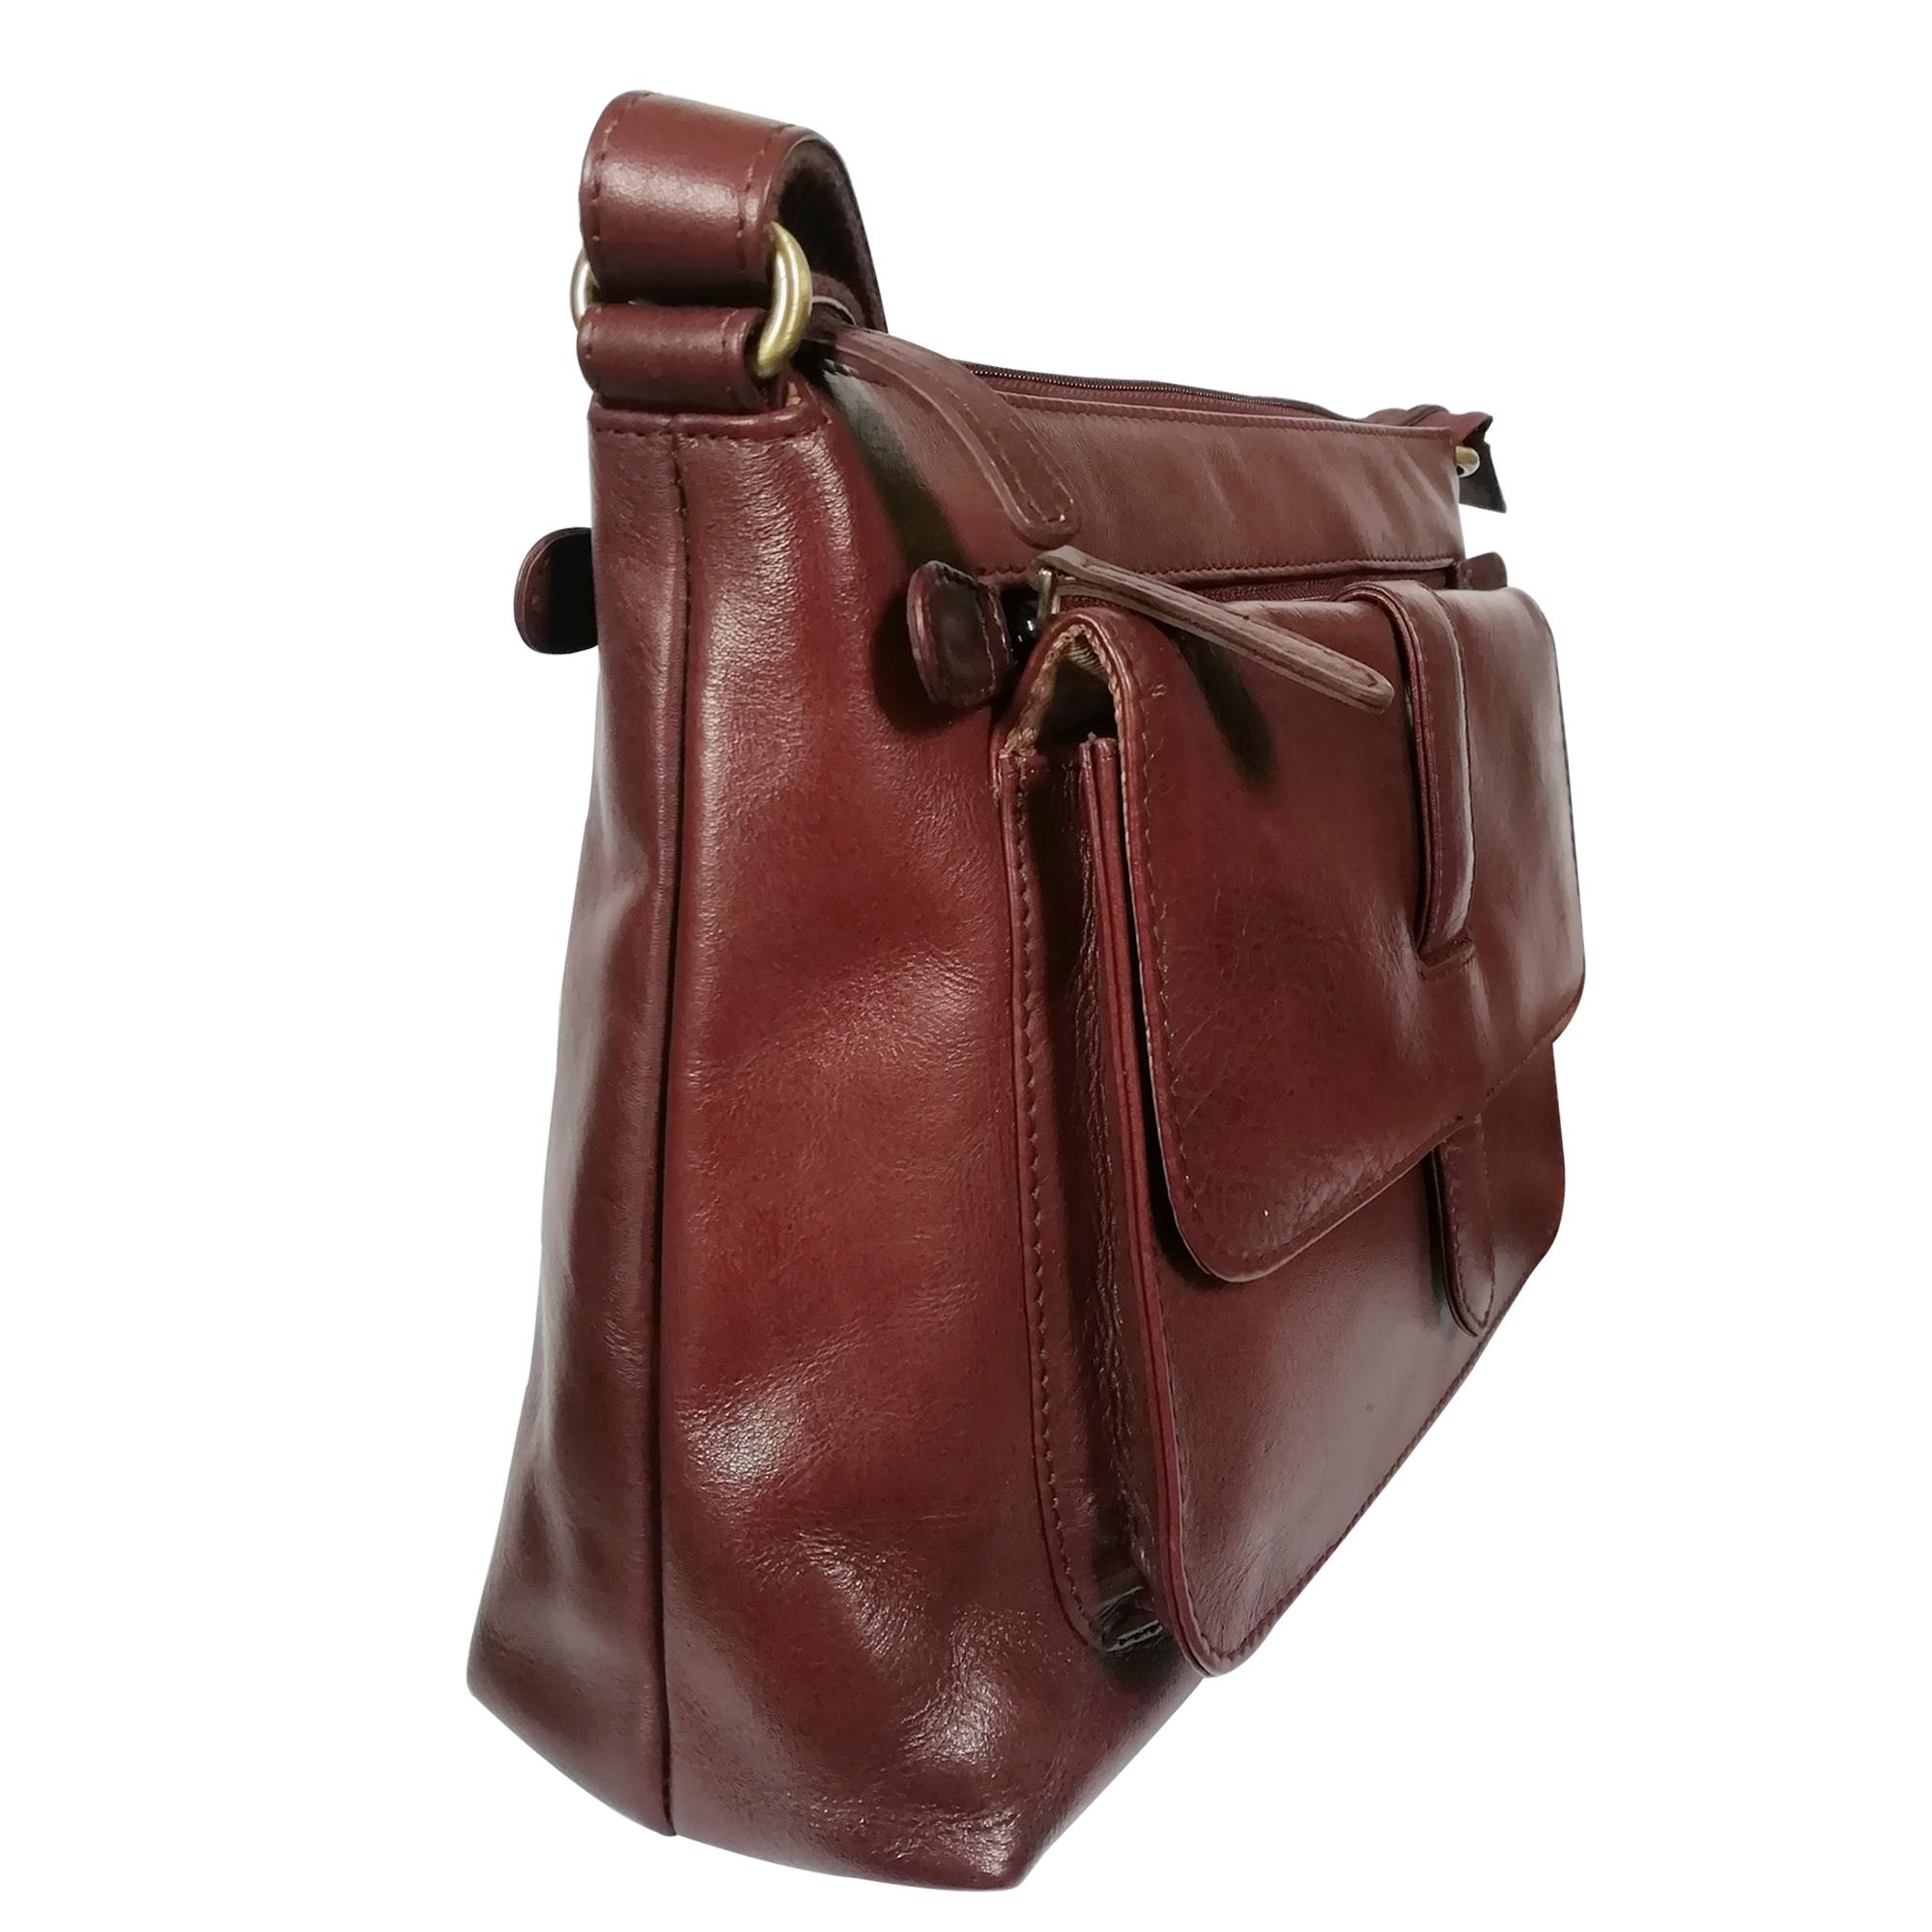 New Leather Shoulder Women Sling Crossbody Handbag